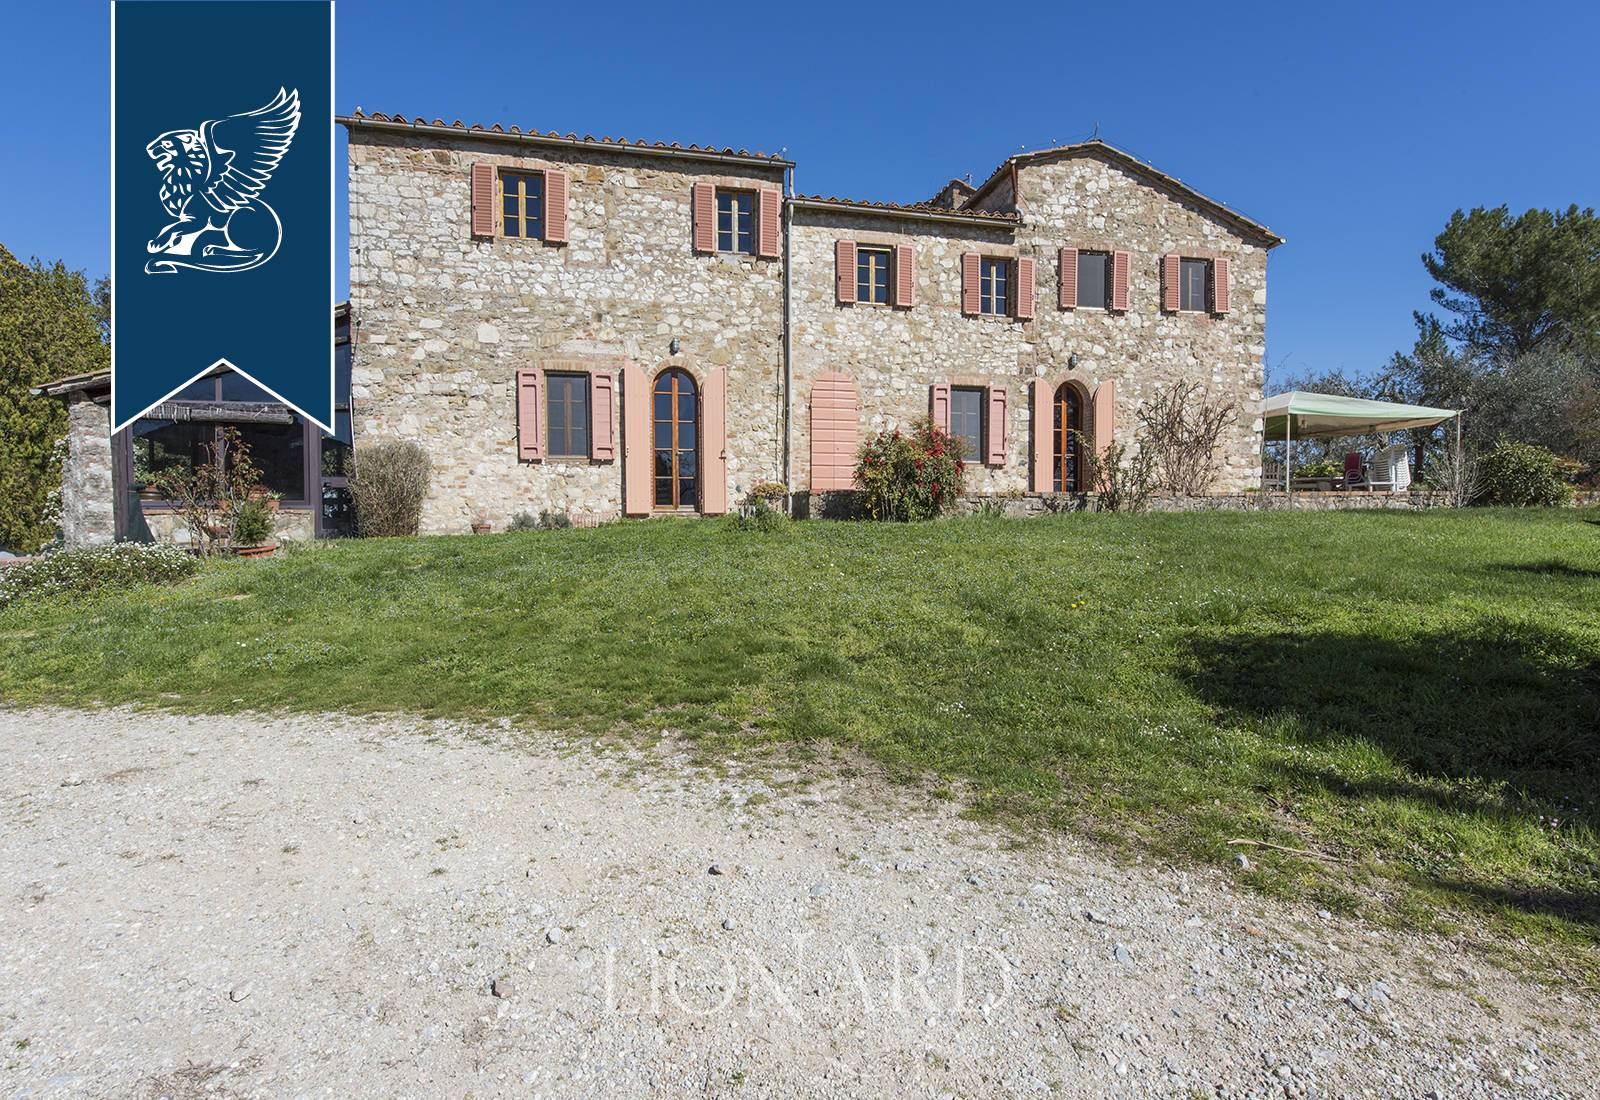 Azienda in Vendita a Colle Di Val D'Elsa: 0 locali, 1400 mq - Foto 8